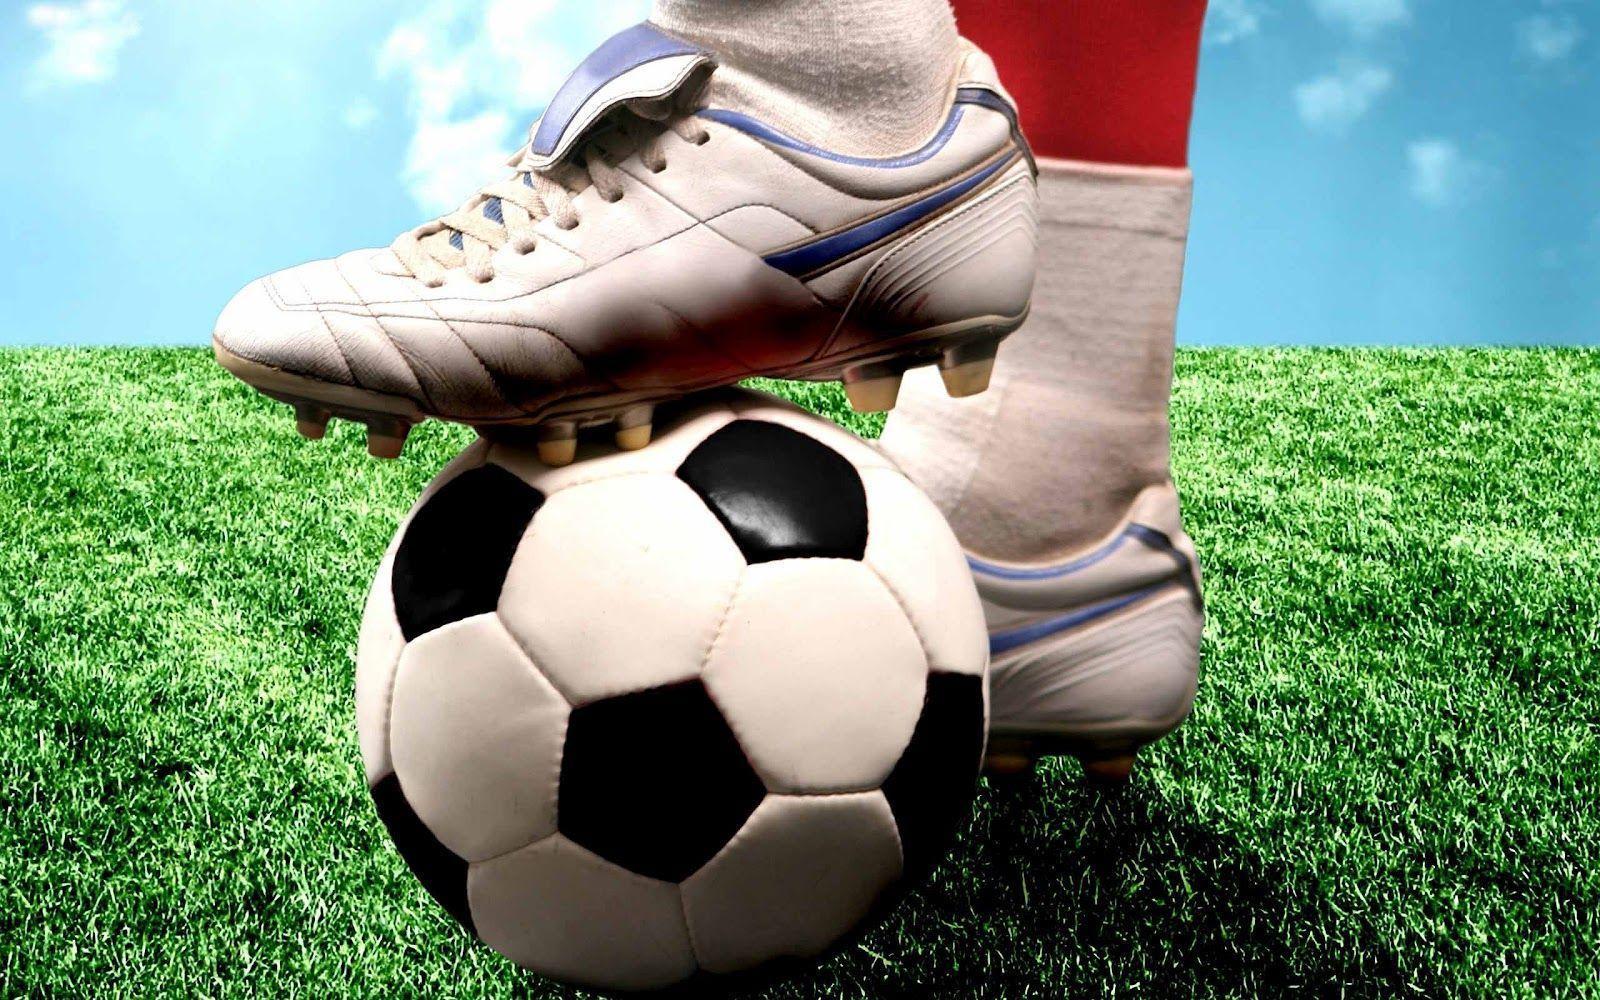 22 Hd Sports Wallpapers Backgrounds Images: Soccer Desktop Backgrounds